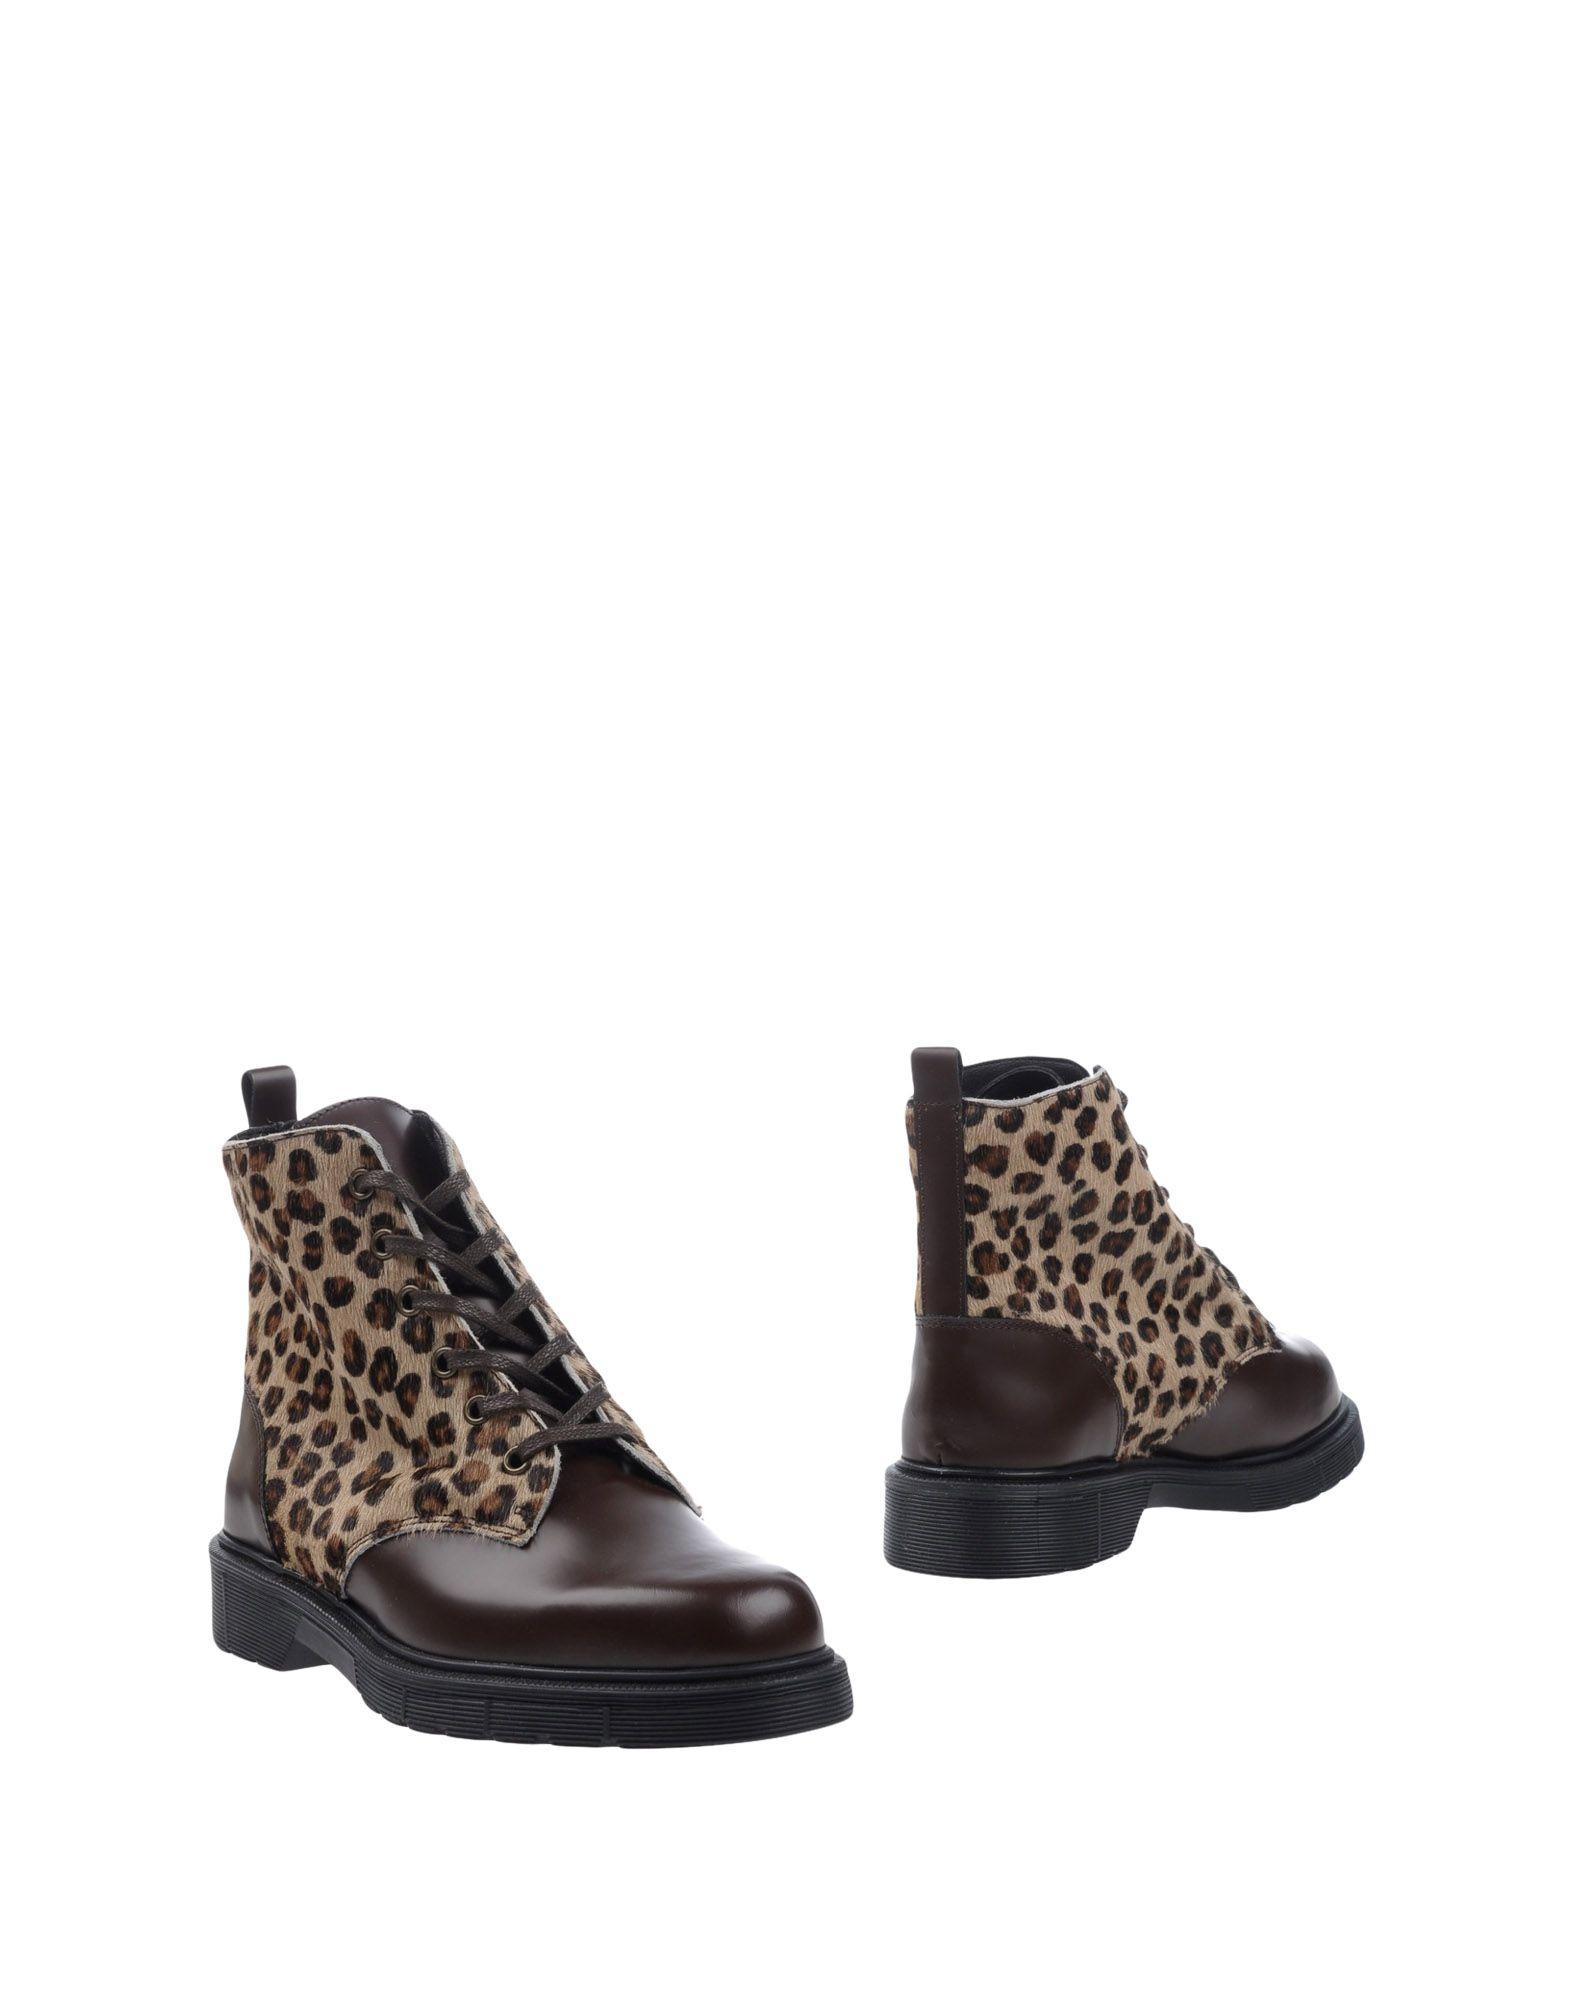 Penelope Stiefelette Damen  11296202RJ Gute Qualität beliebte Schuhe